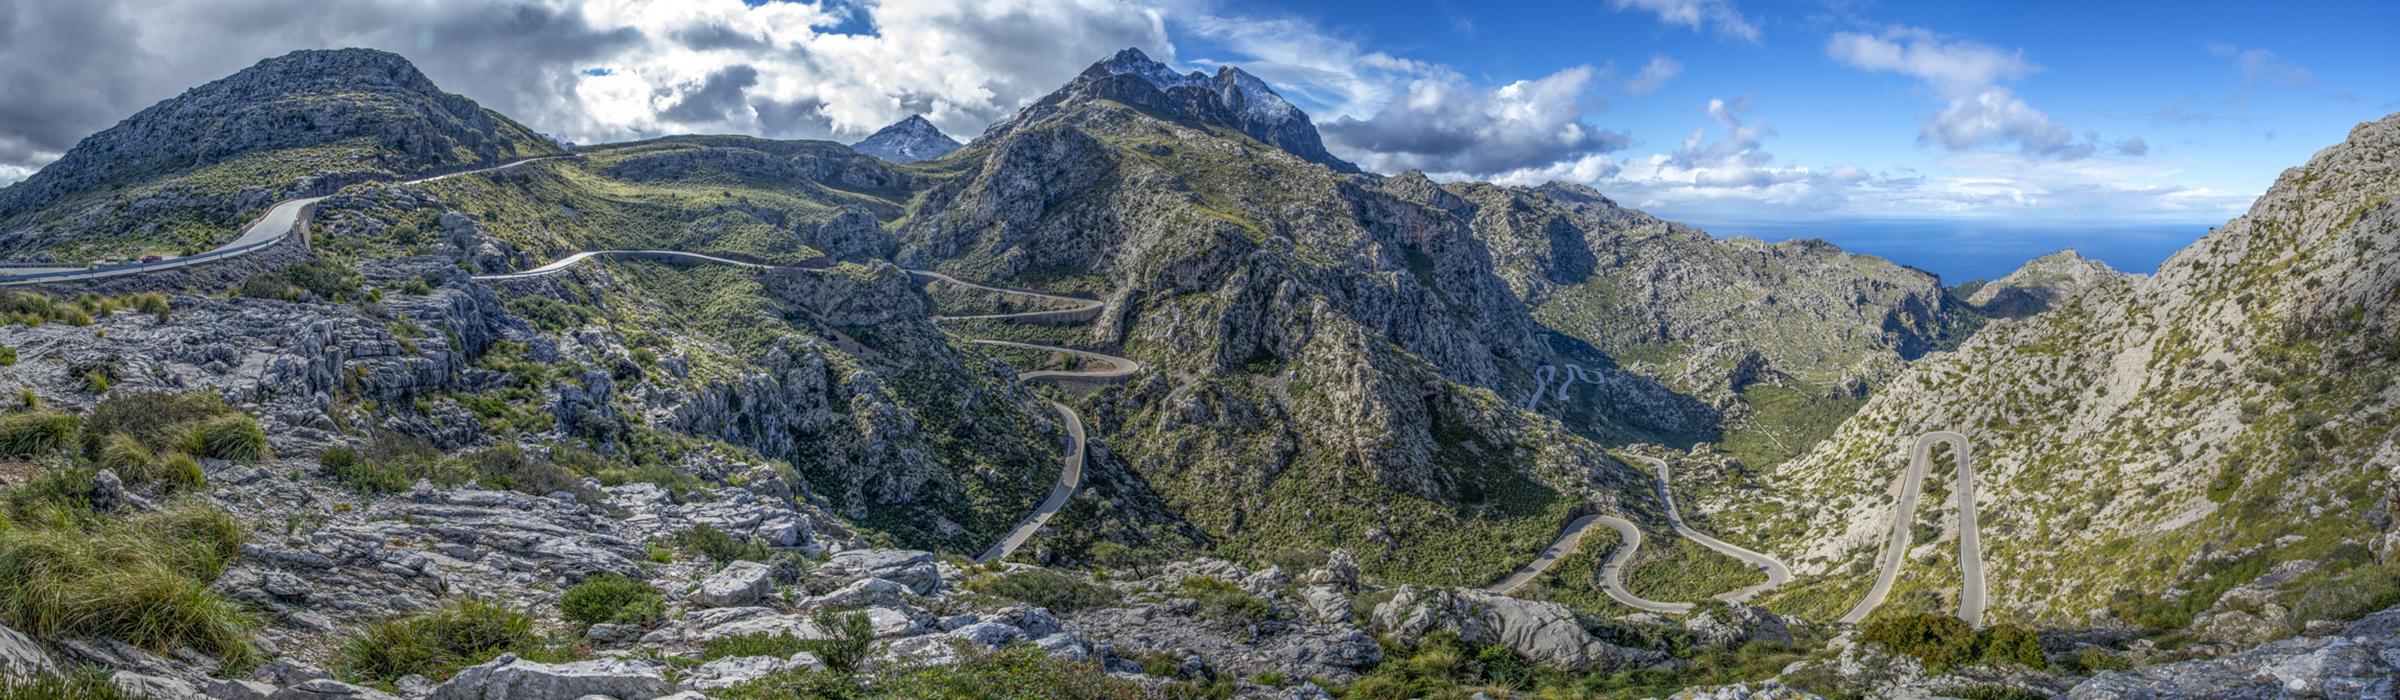 Berglandschaft in Mallorca